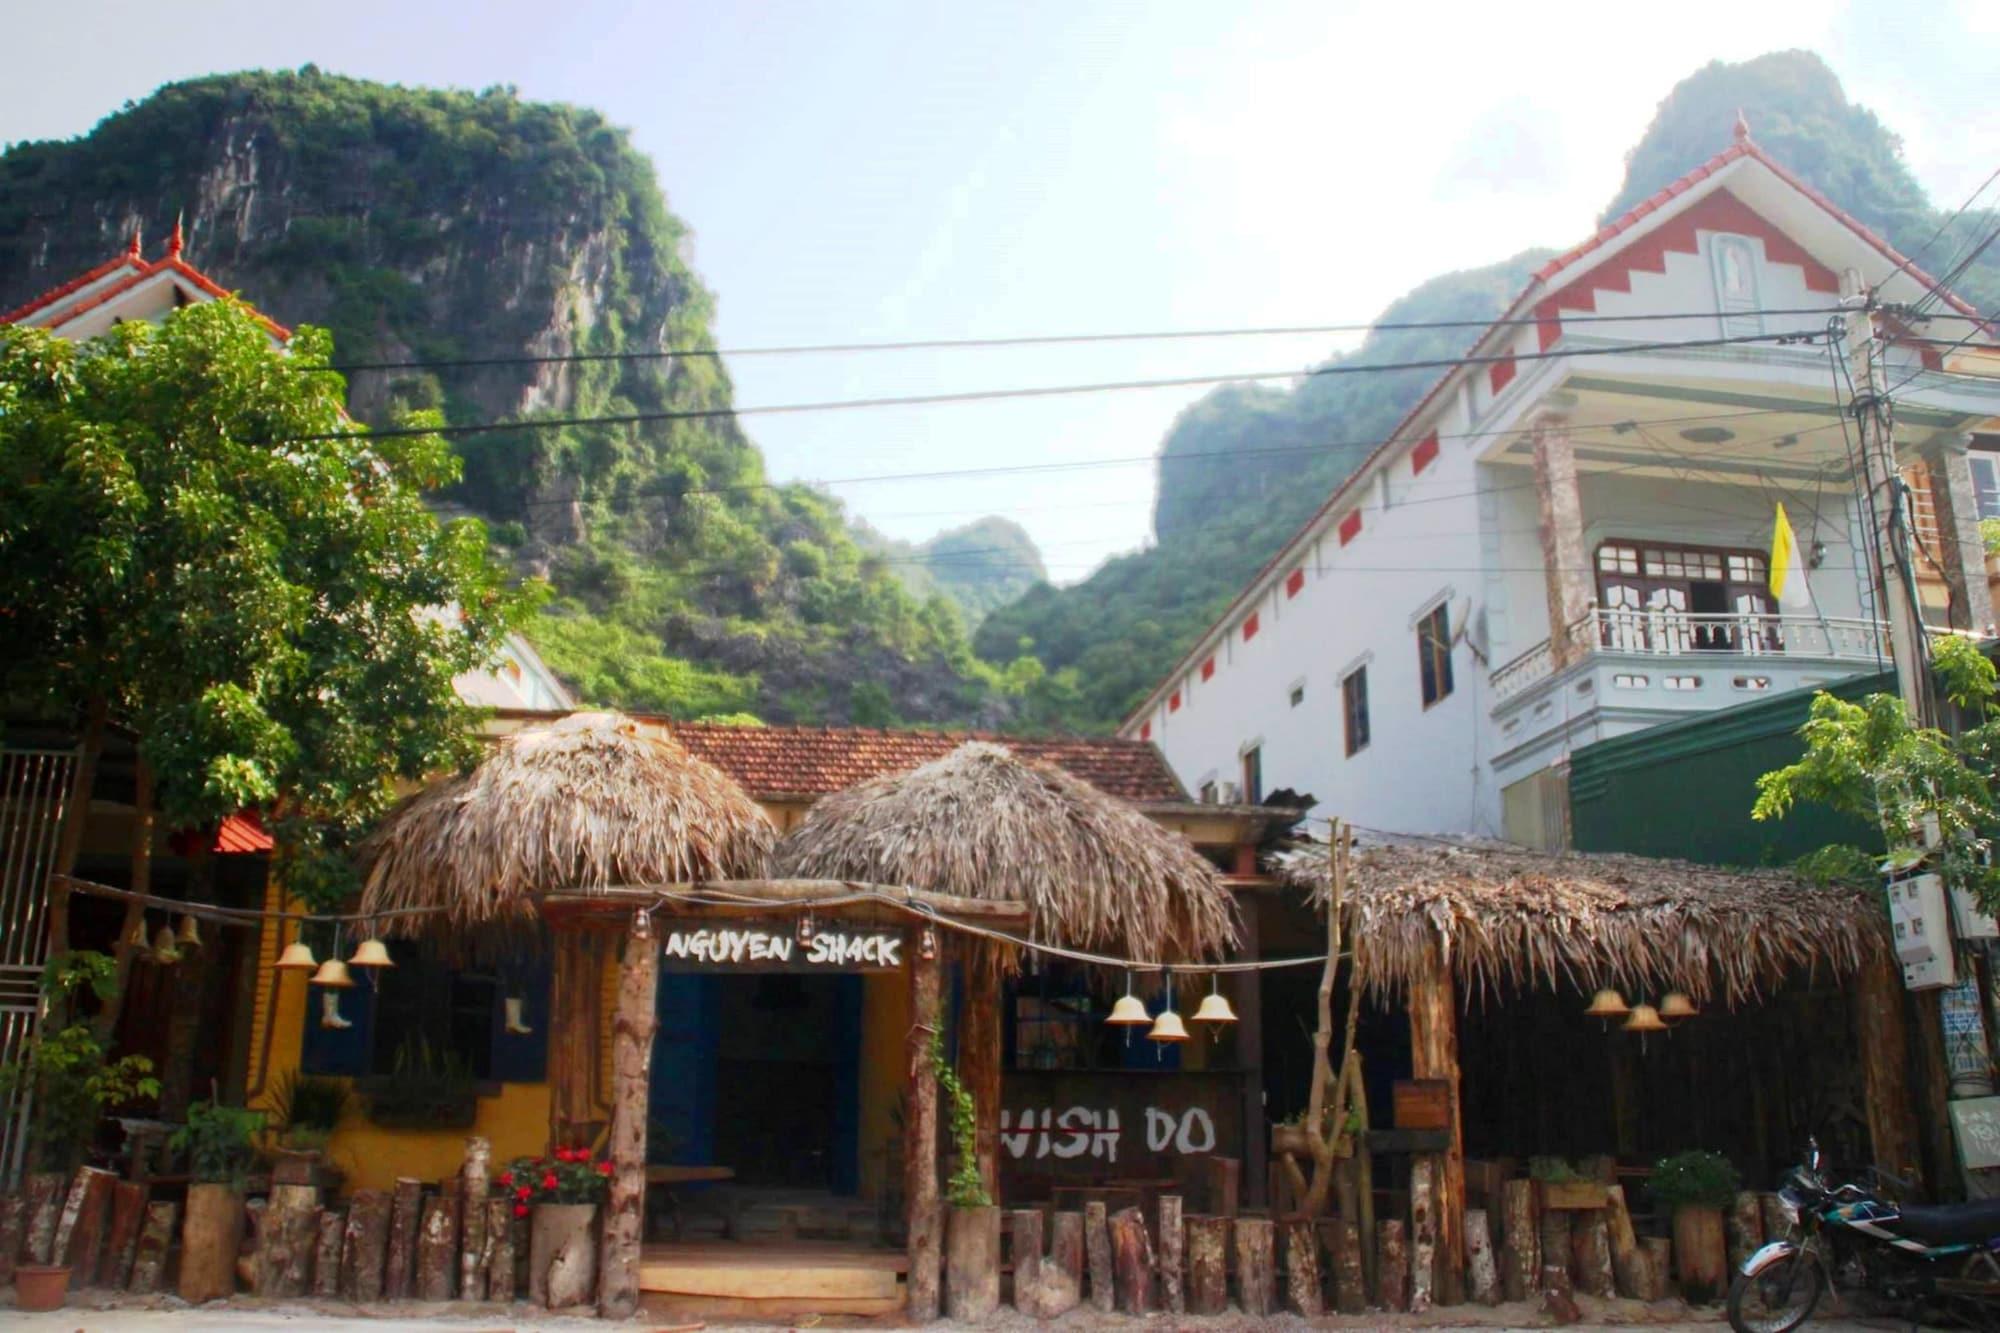 Nguyen Shack Phong Nha Central Town, Bố Trạch